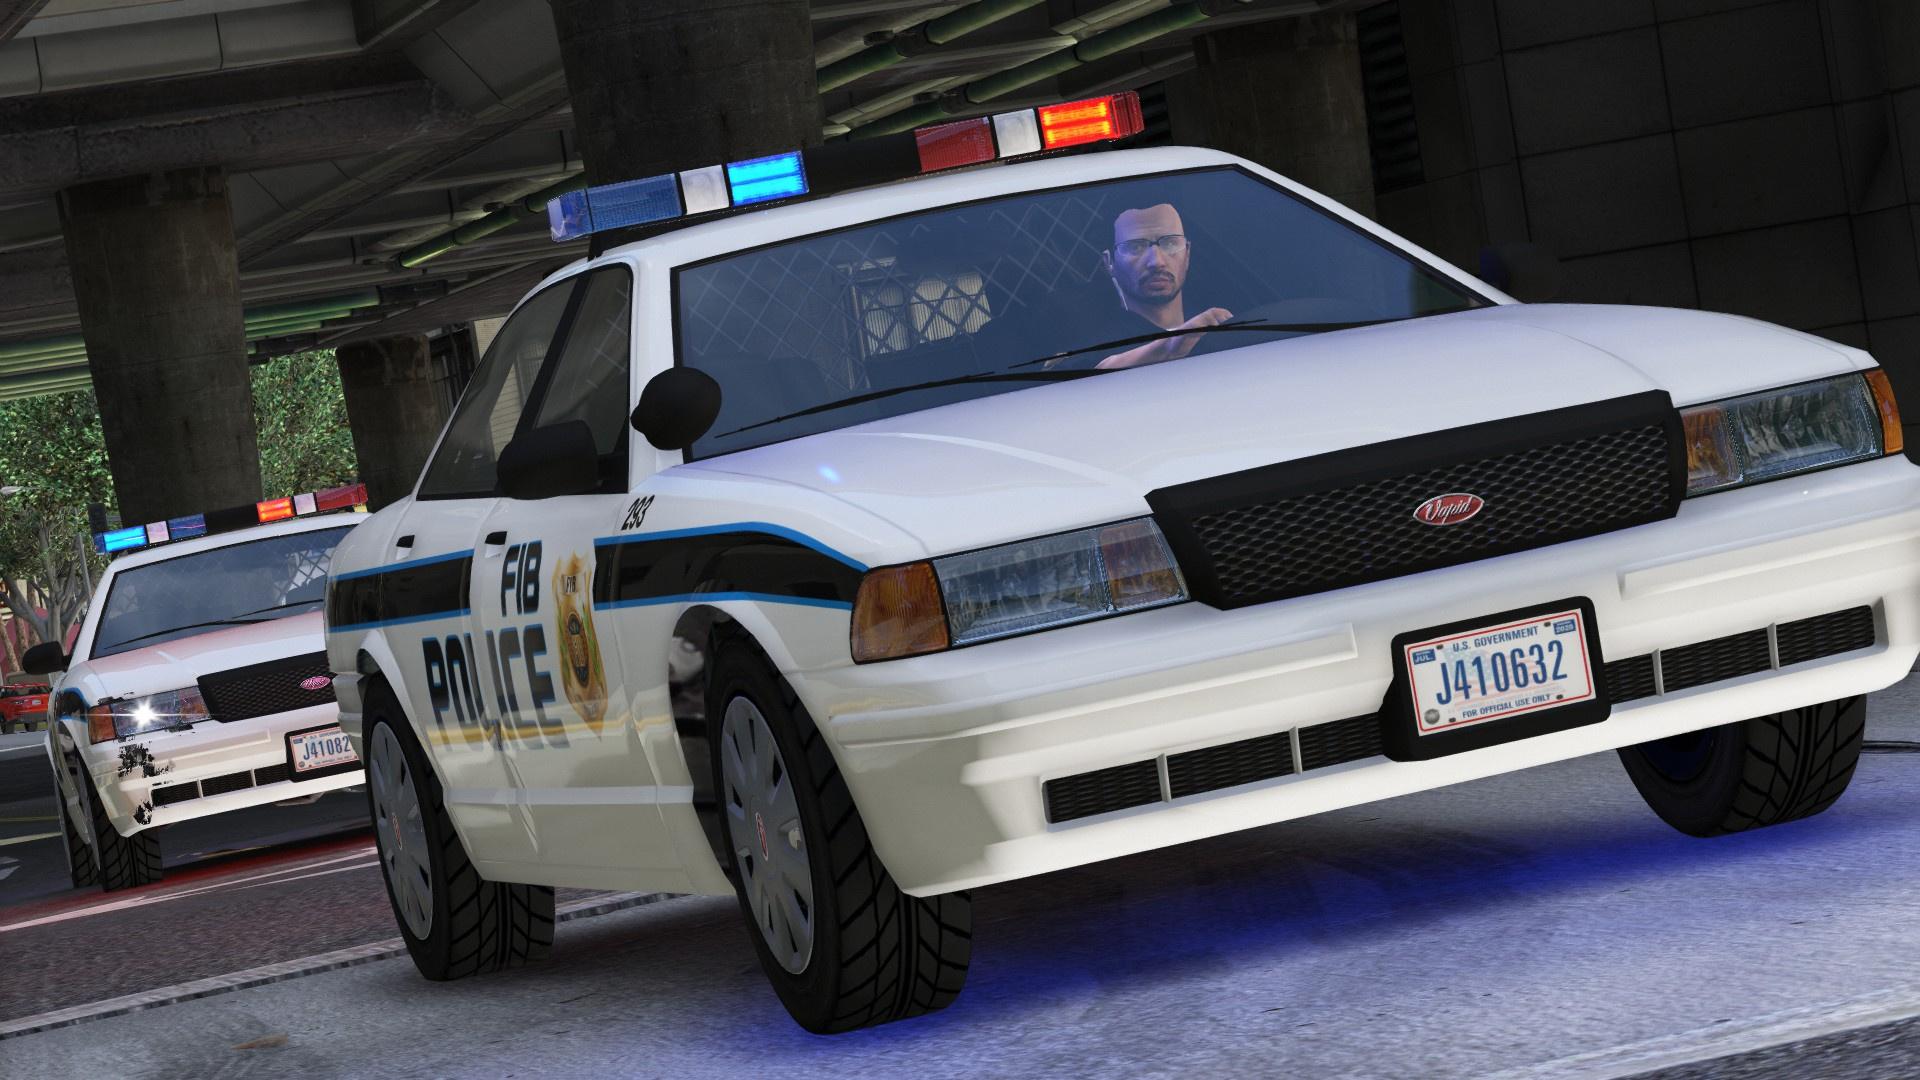 FIB Police Pack [Add-On]